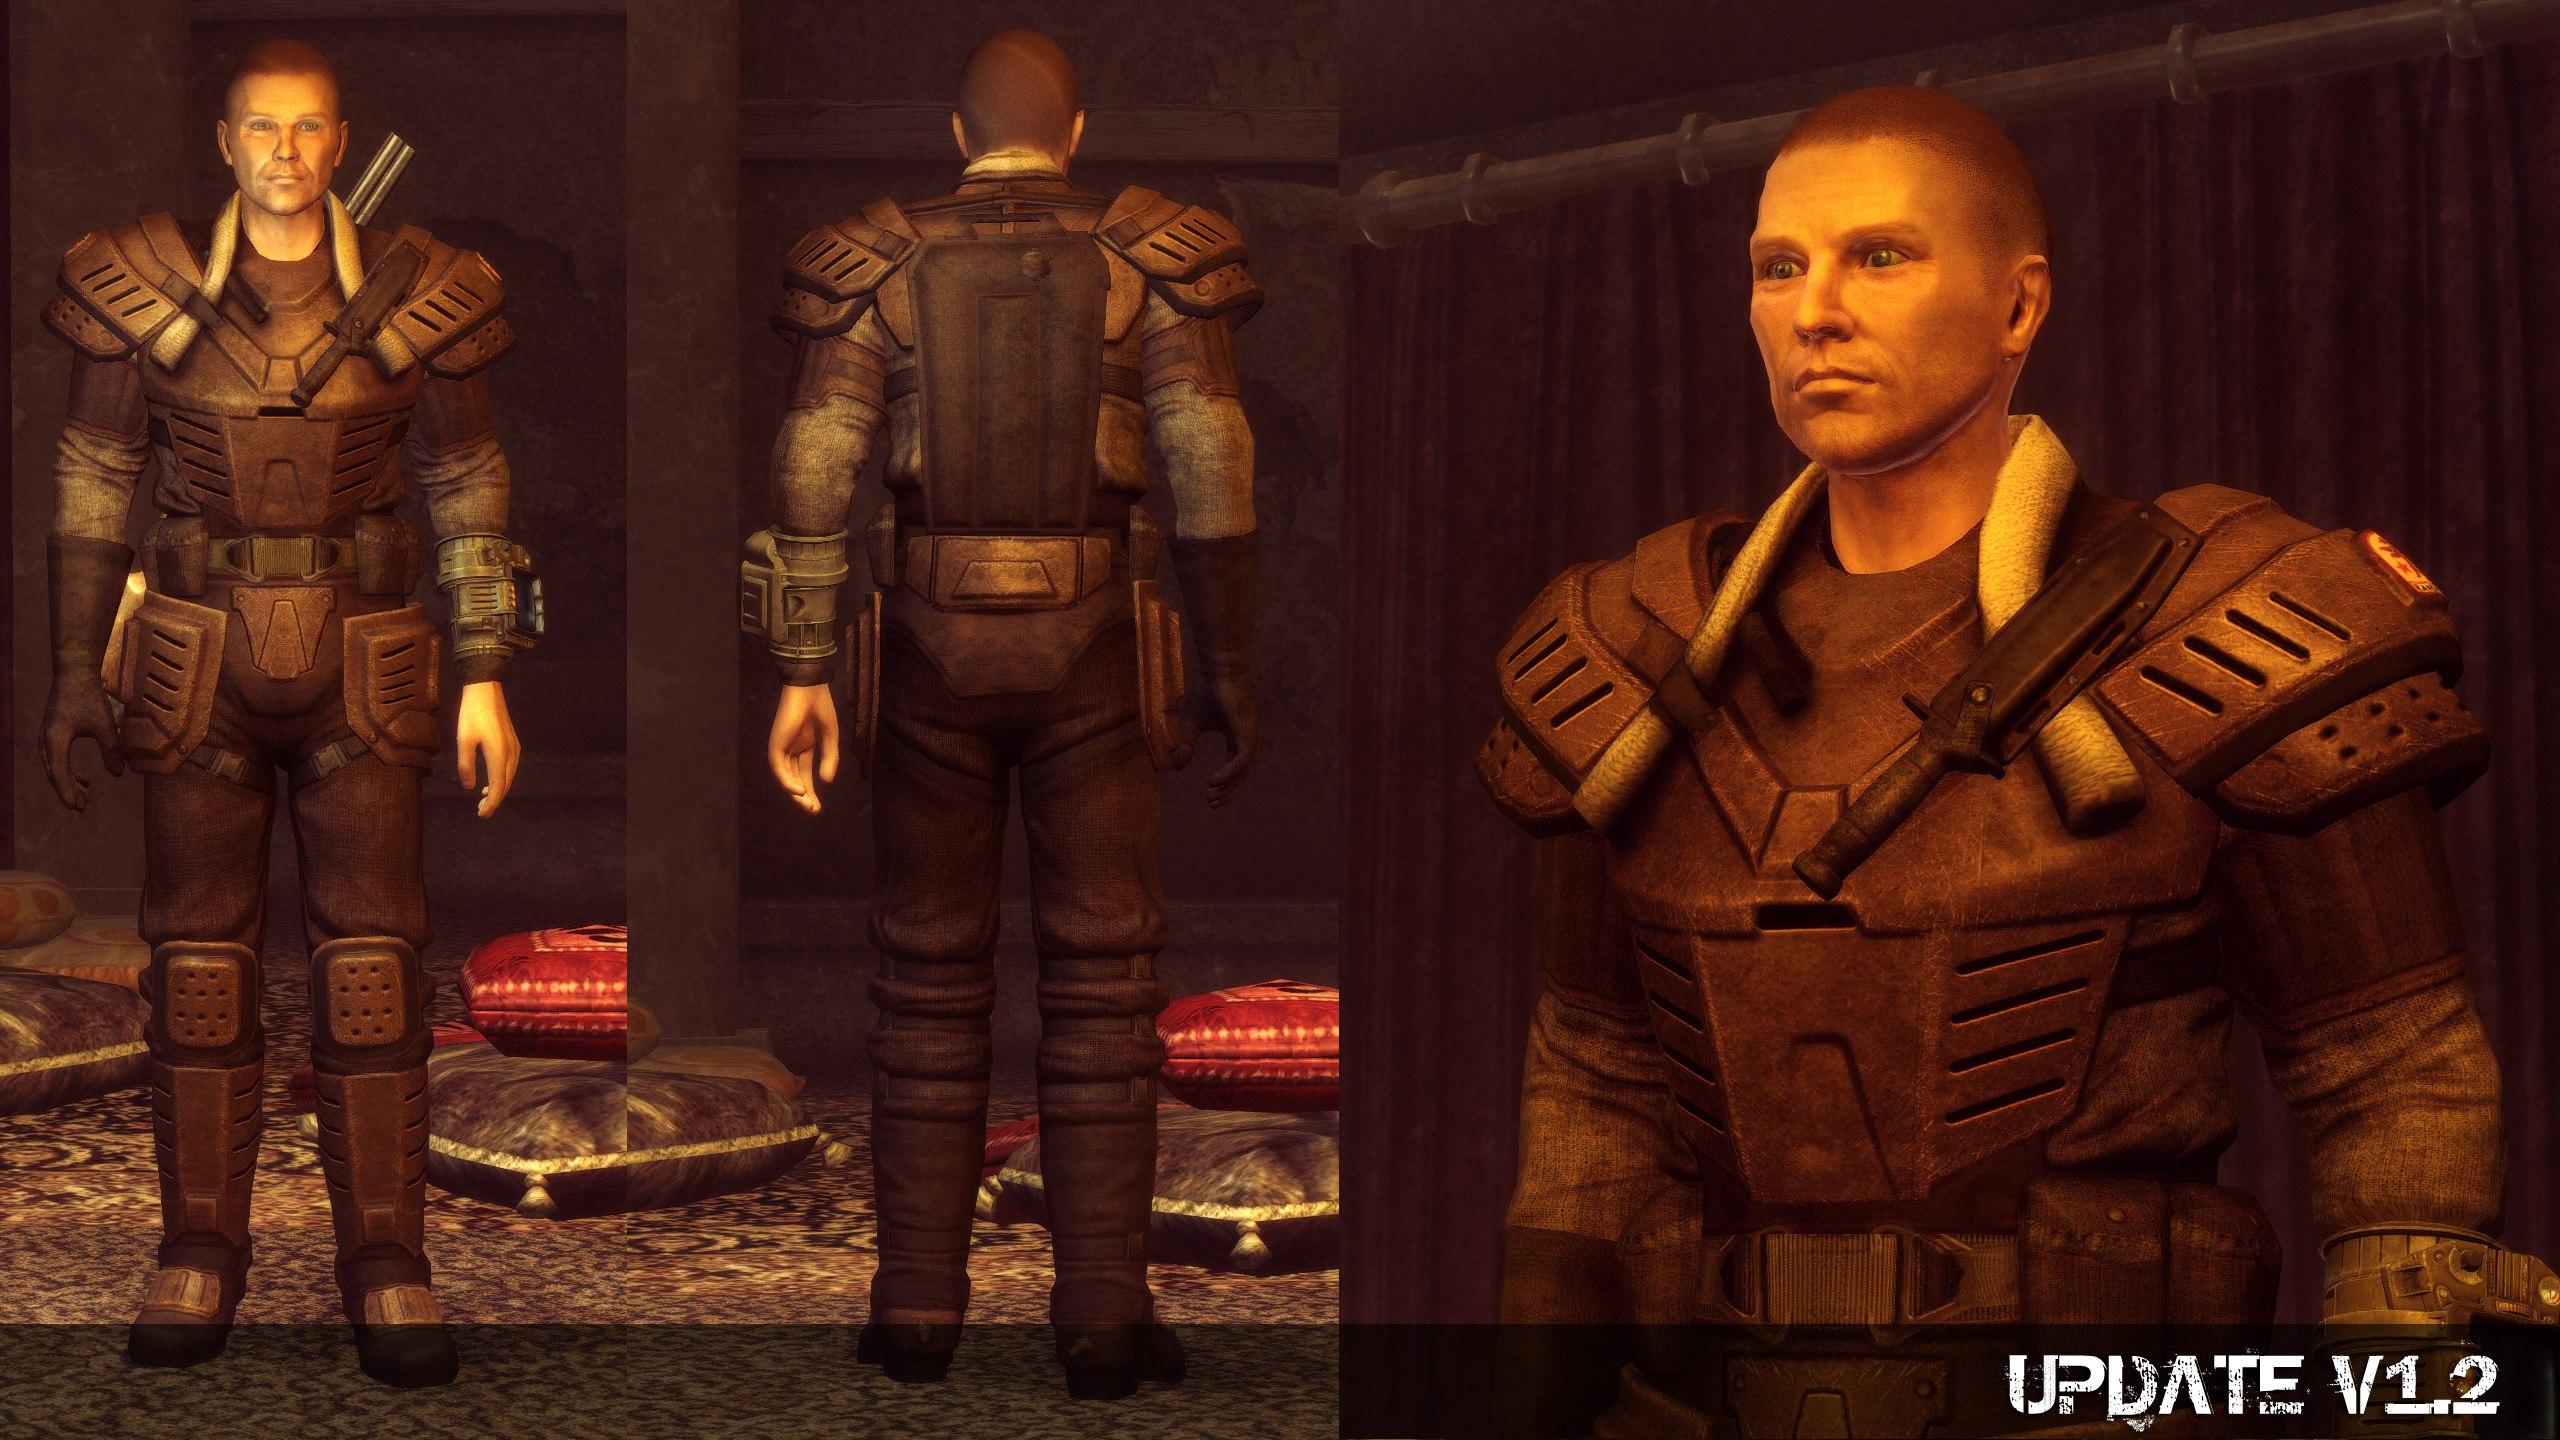 Joctaviuscaesar's Fallout 3 Revamped